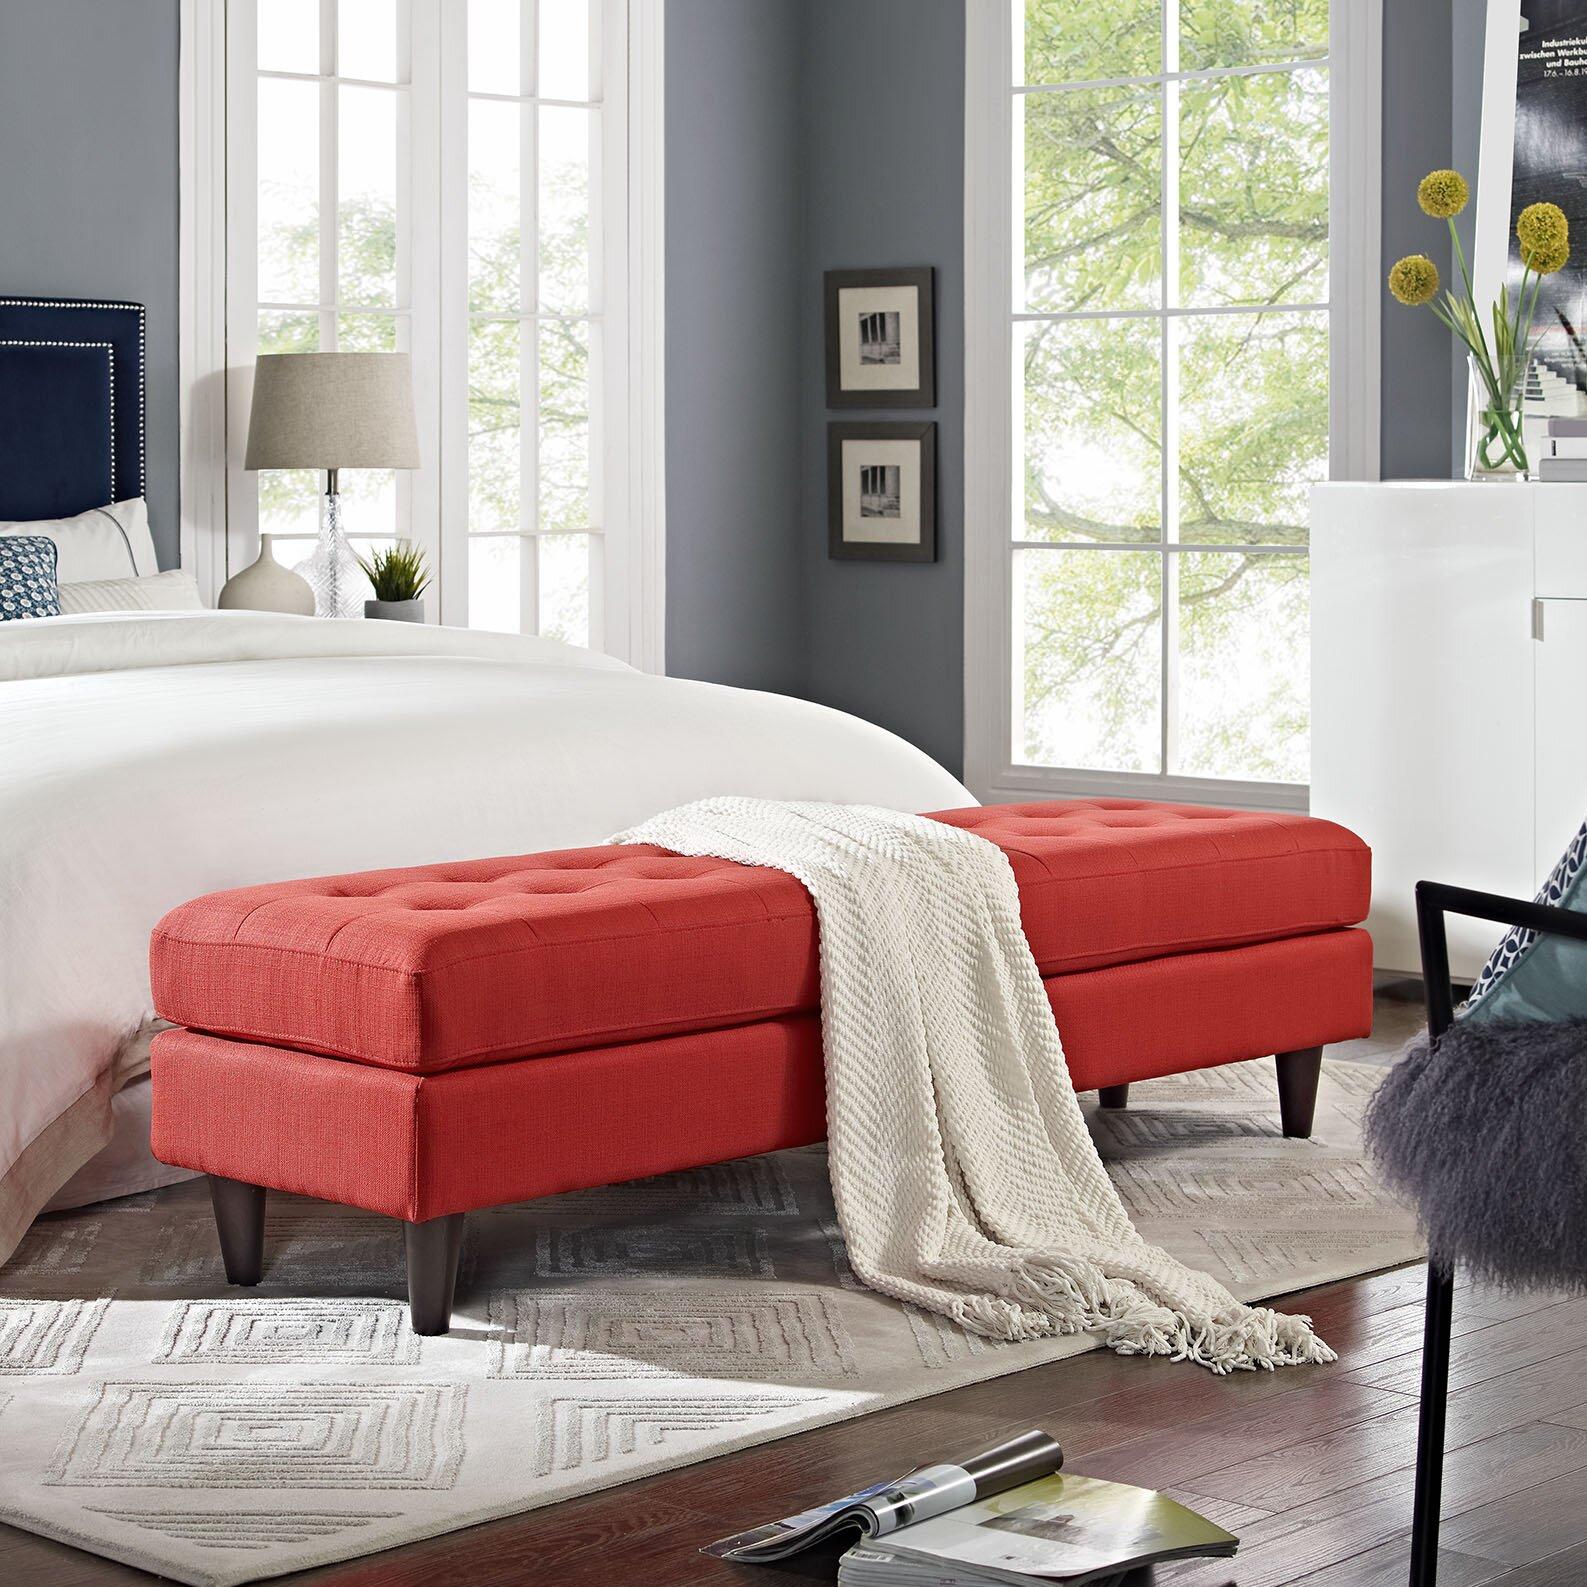 Modway Empress Bedroom Bench & Reviews